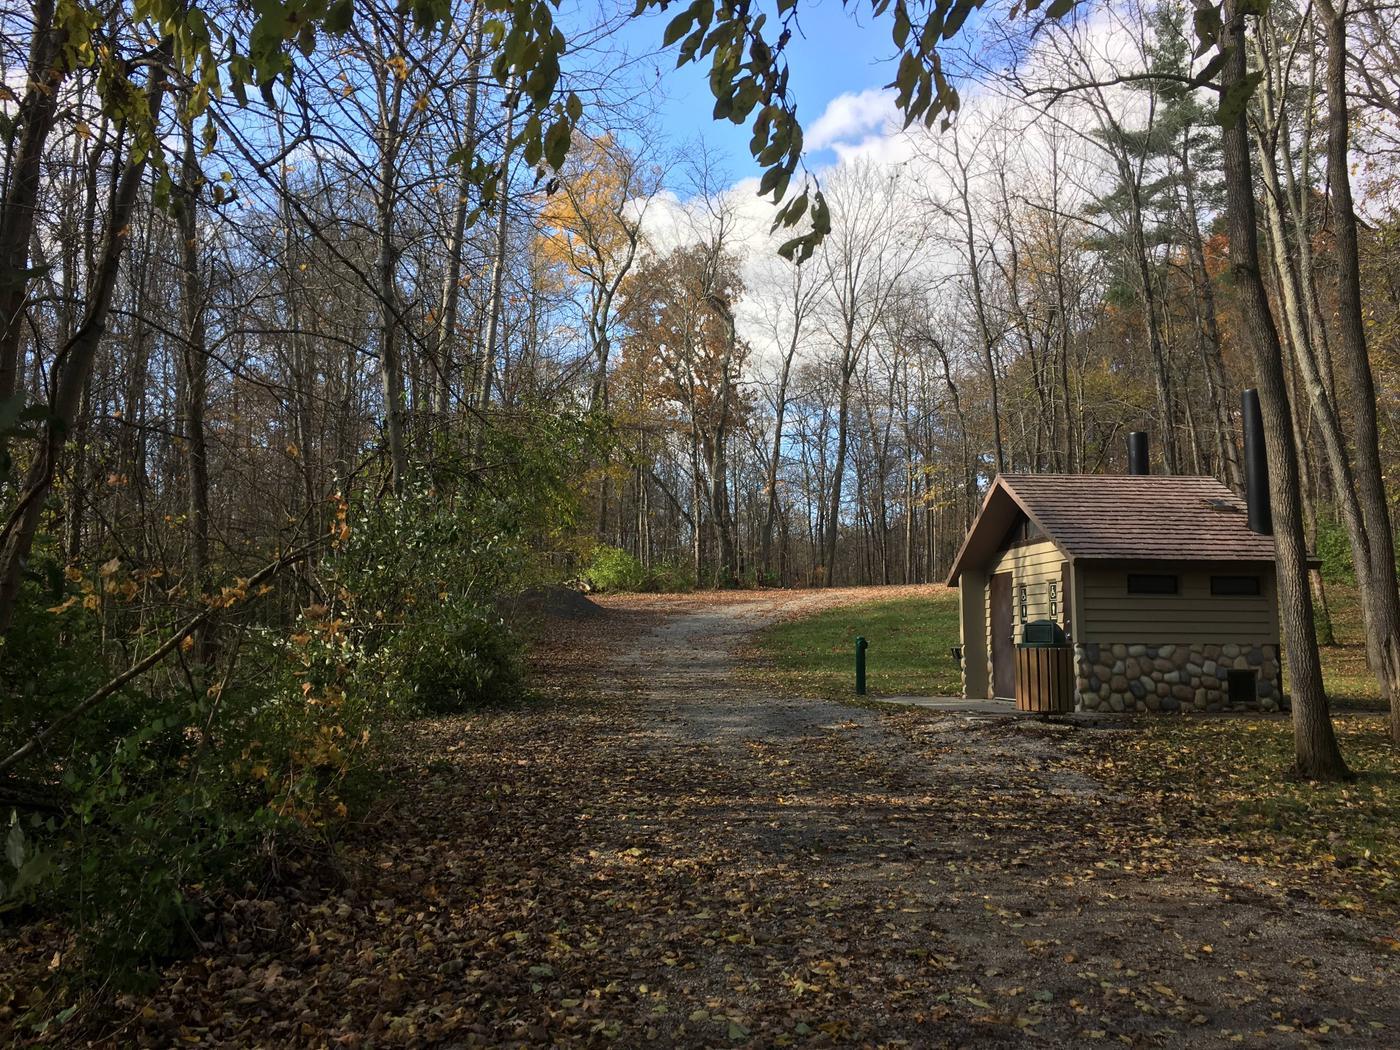 DELAWARE LAKE DAMSITE SHELTERSVault restroom along walking trail